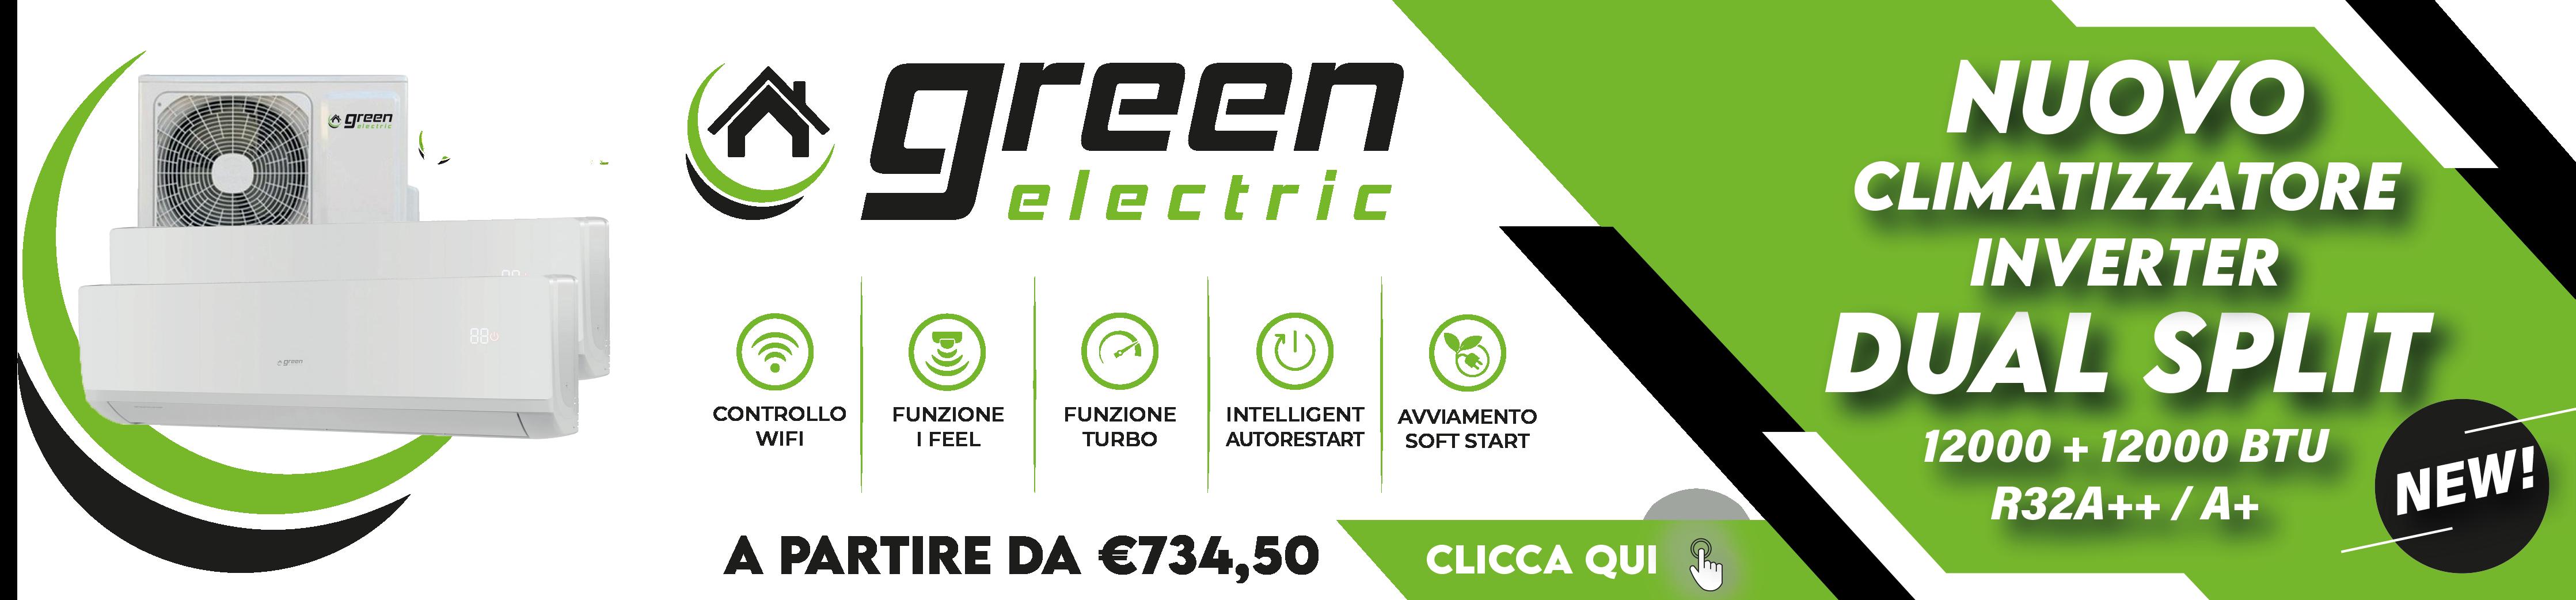 banner_green_definitivo